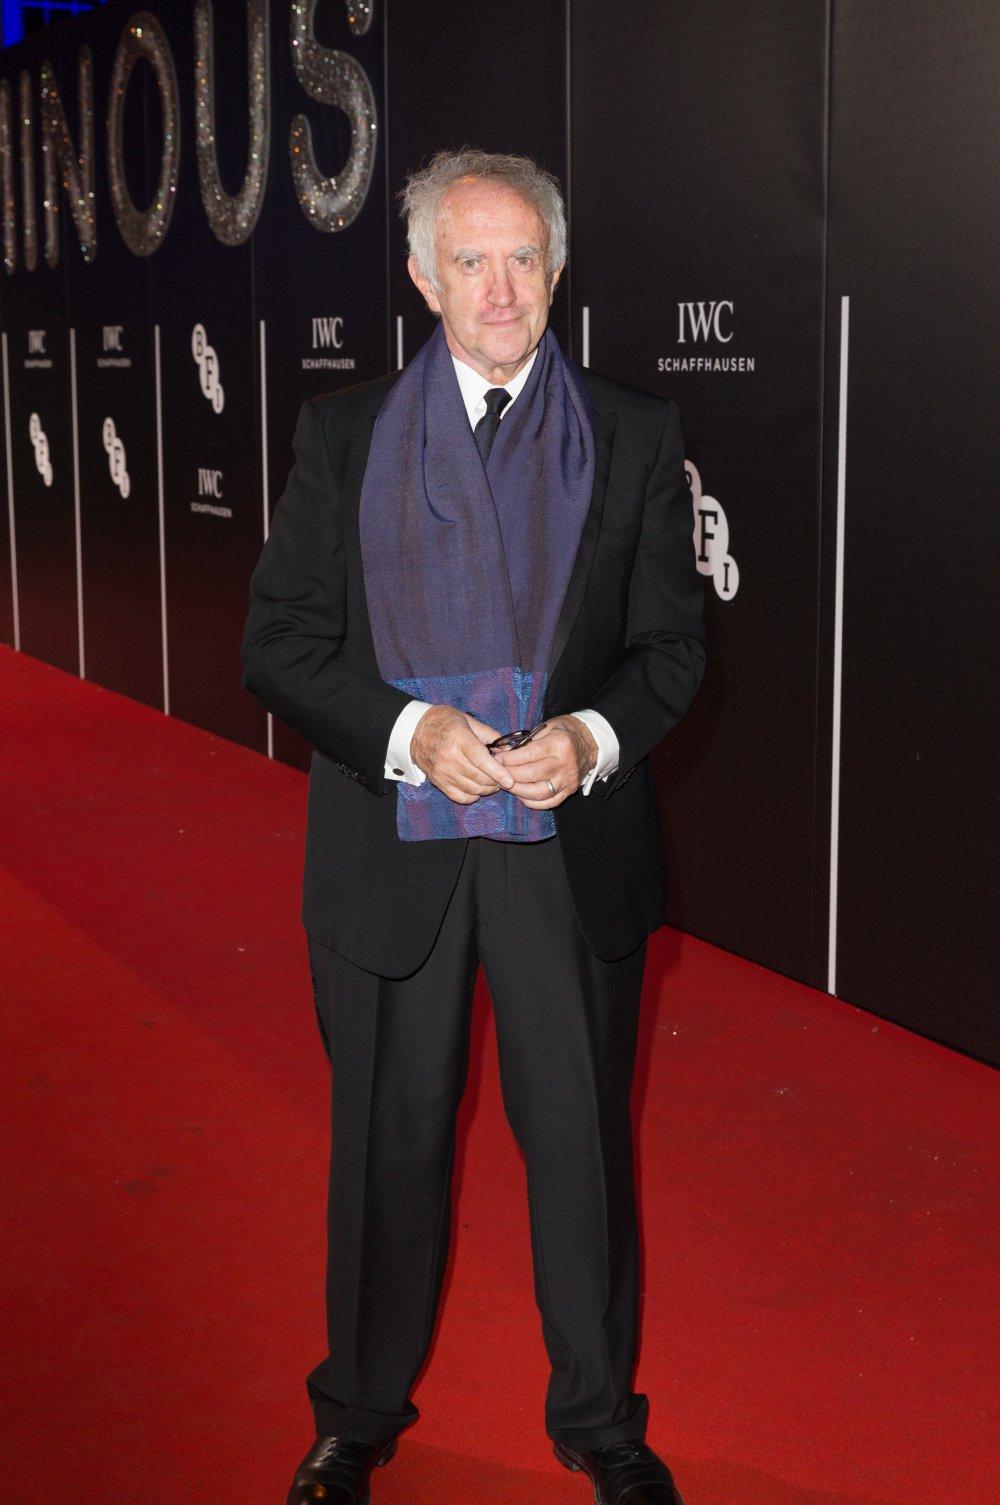 Jonathan Pryce attends the BFI LUMINOUS gala 2015